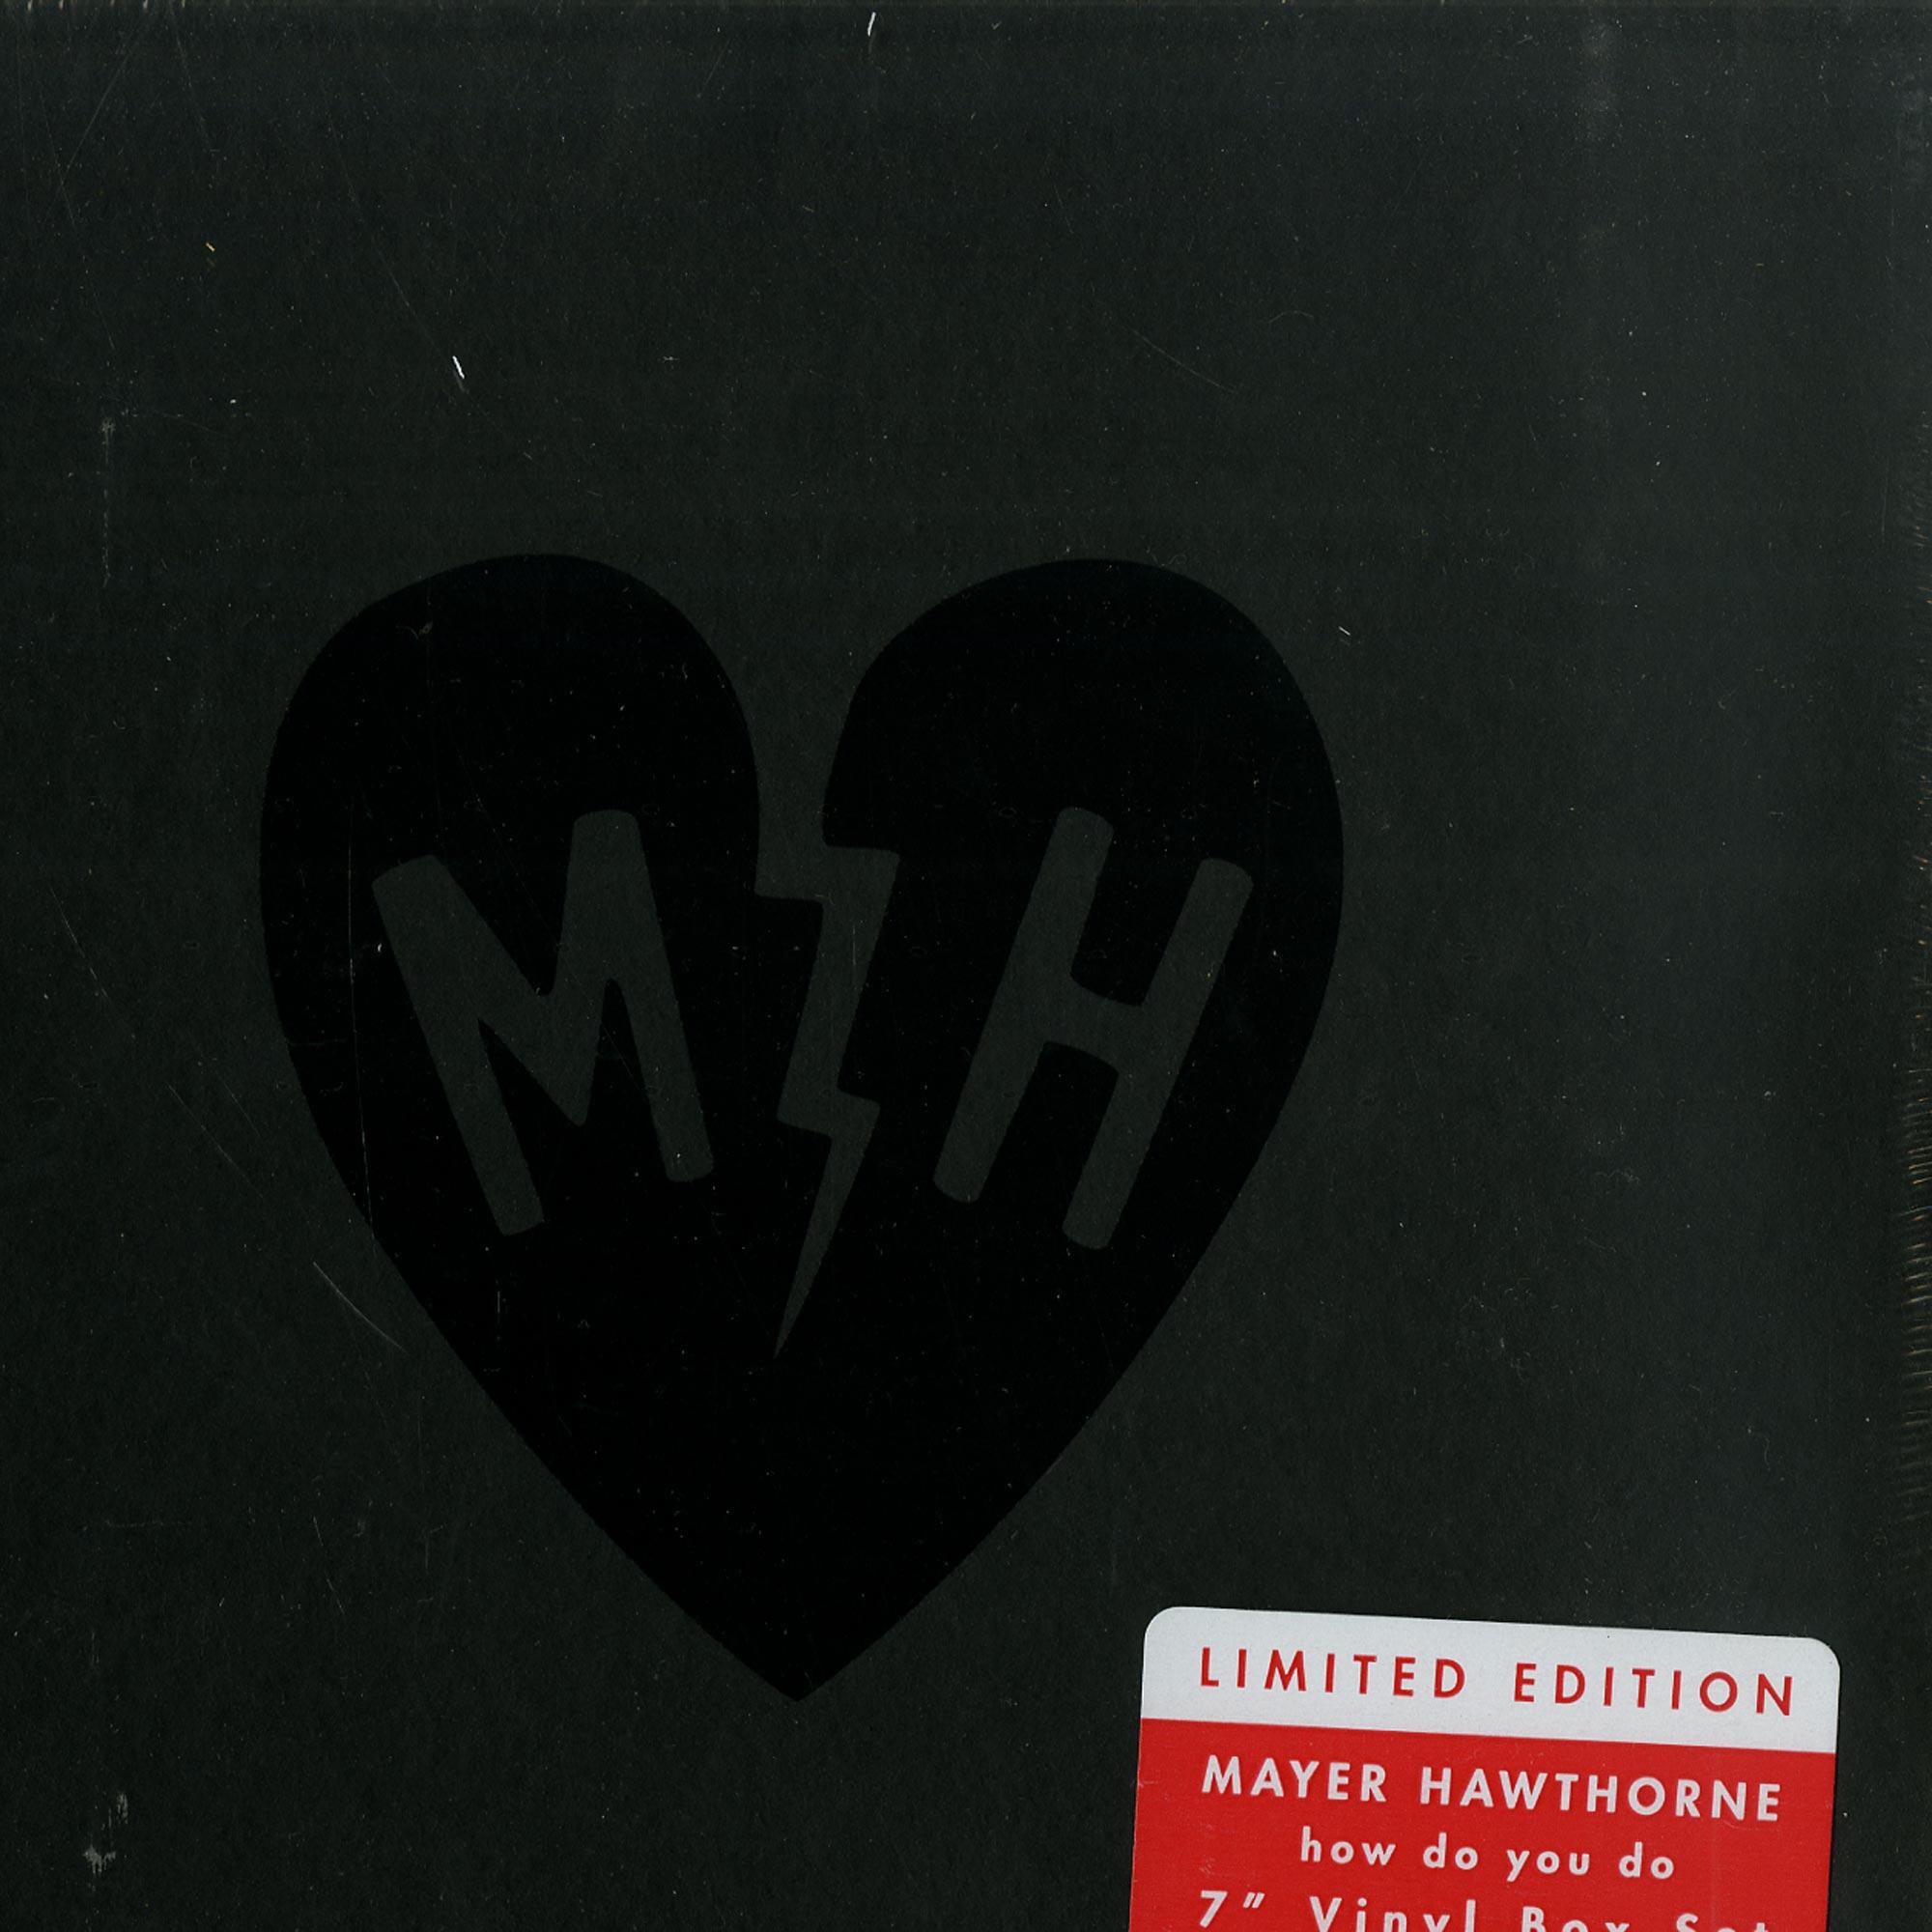 Mayer Hawthorne - HOW DO YOU DO?